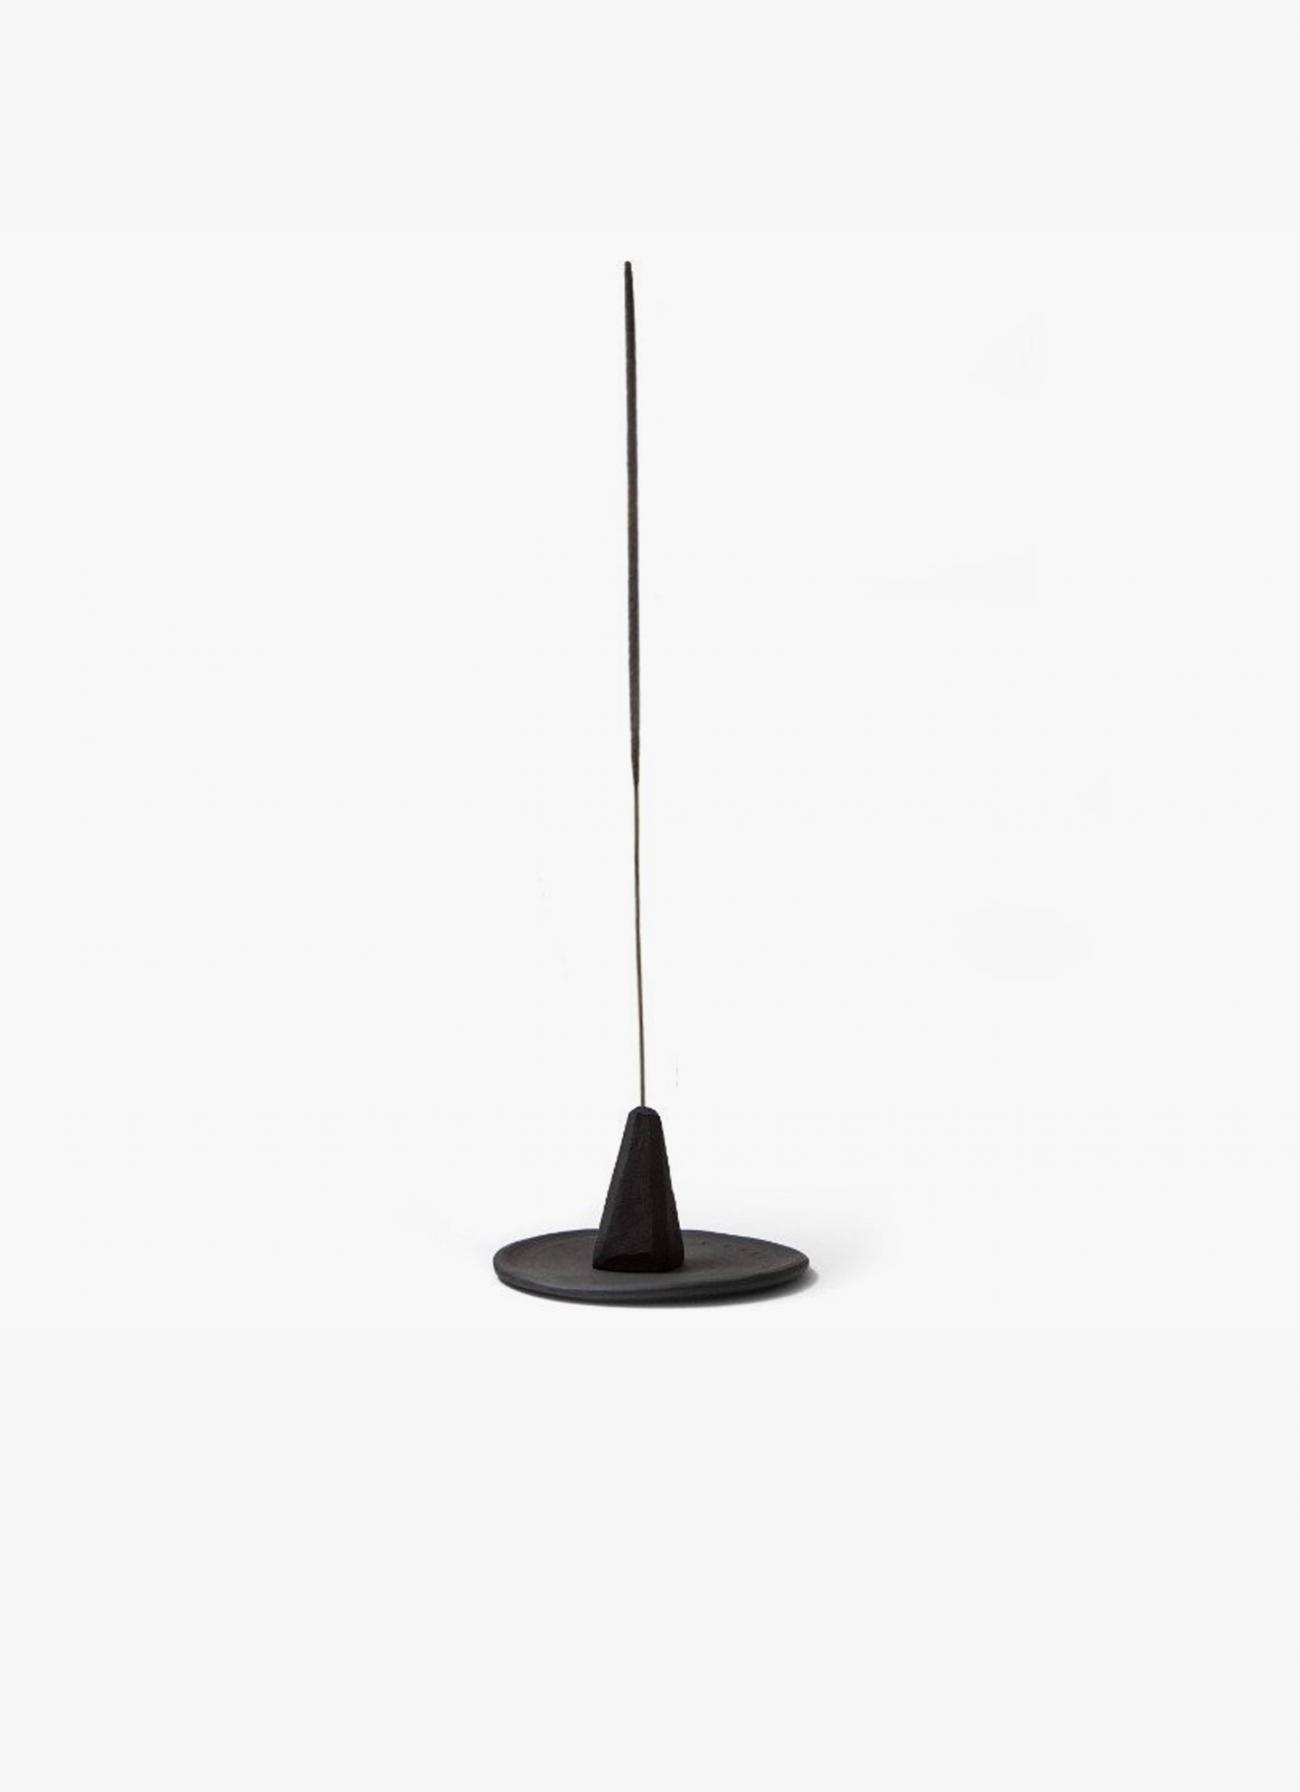 volta_maaps_monolith-hand-thrown-ceramic-incense-holder-black